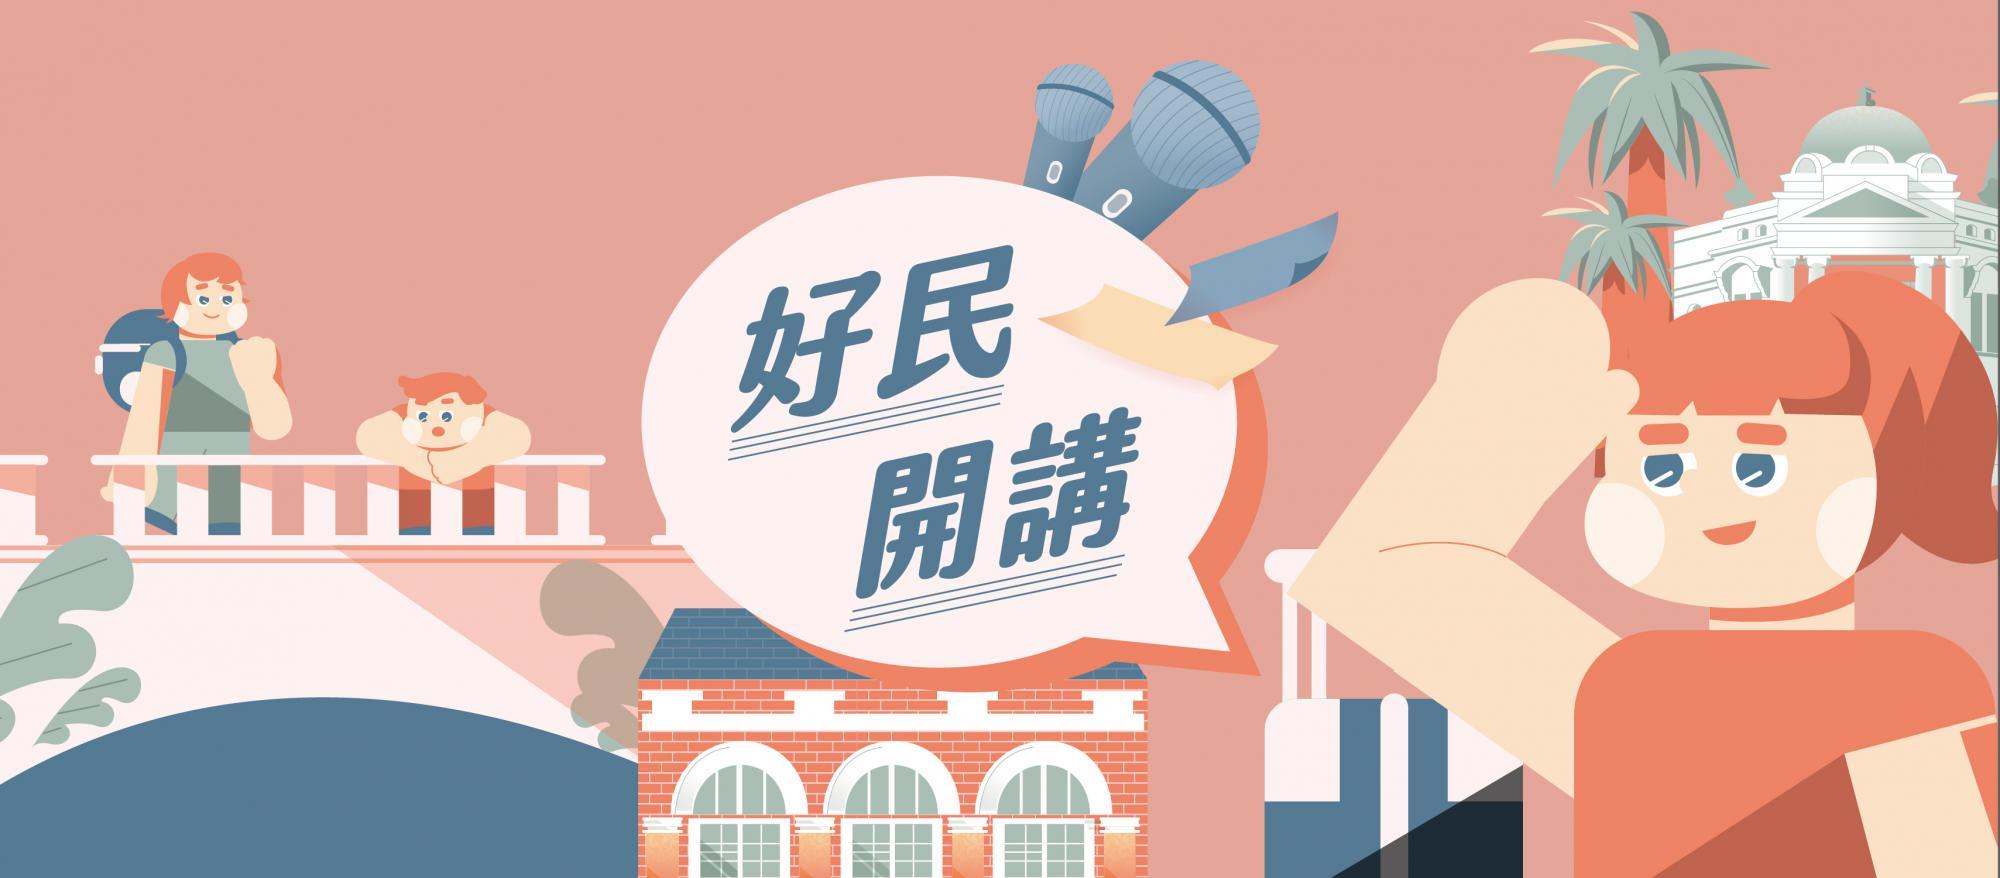 好民開講_banner-01_0.jpg